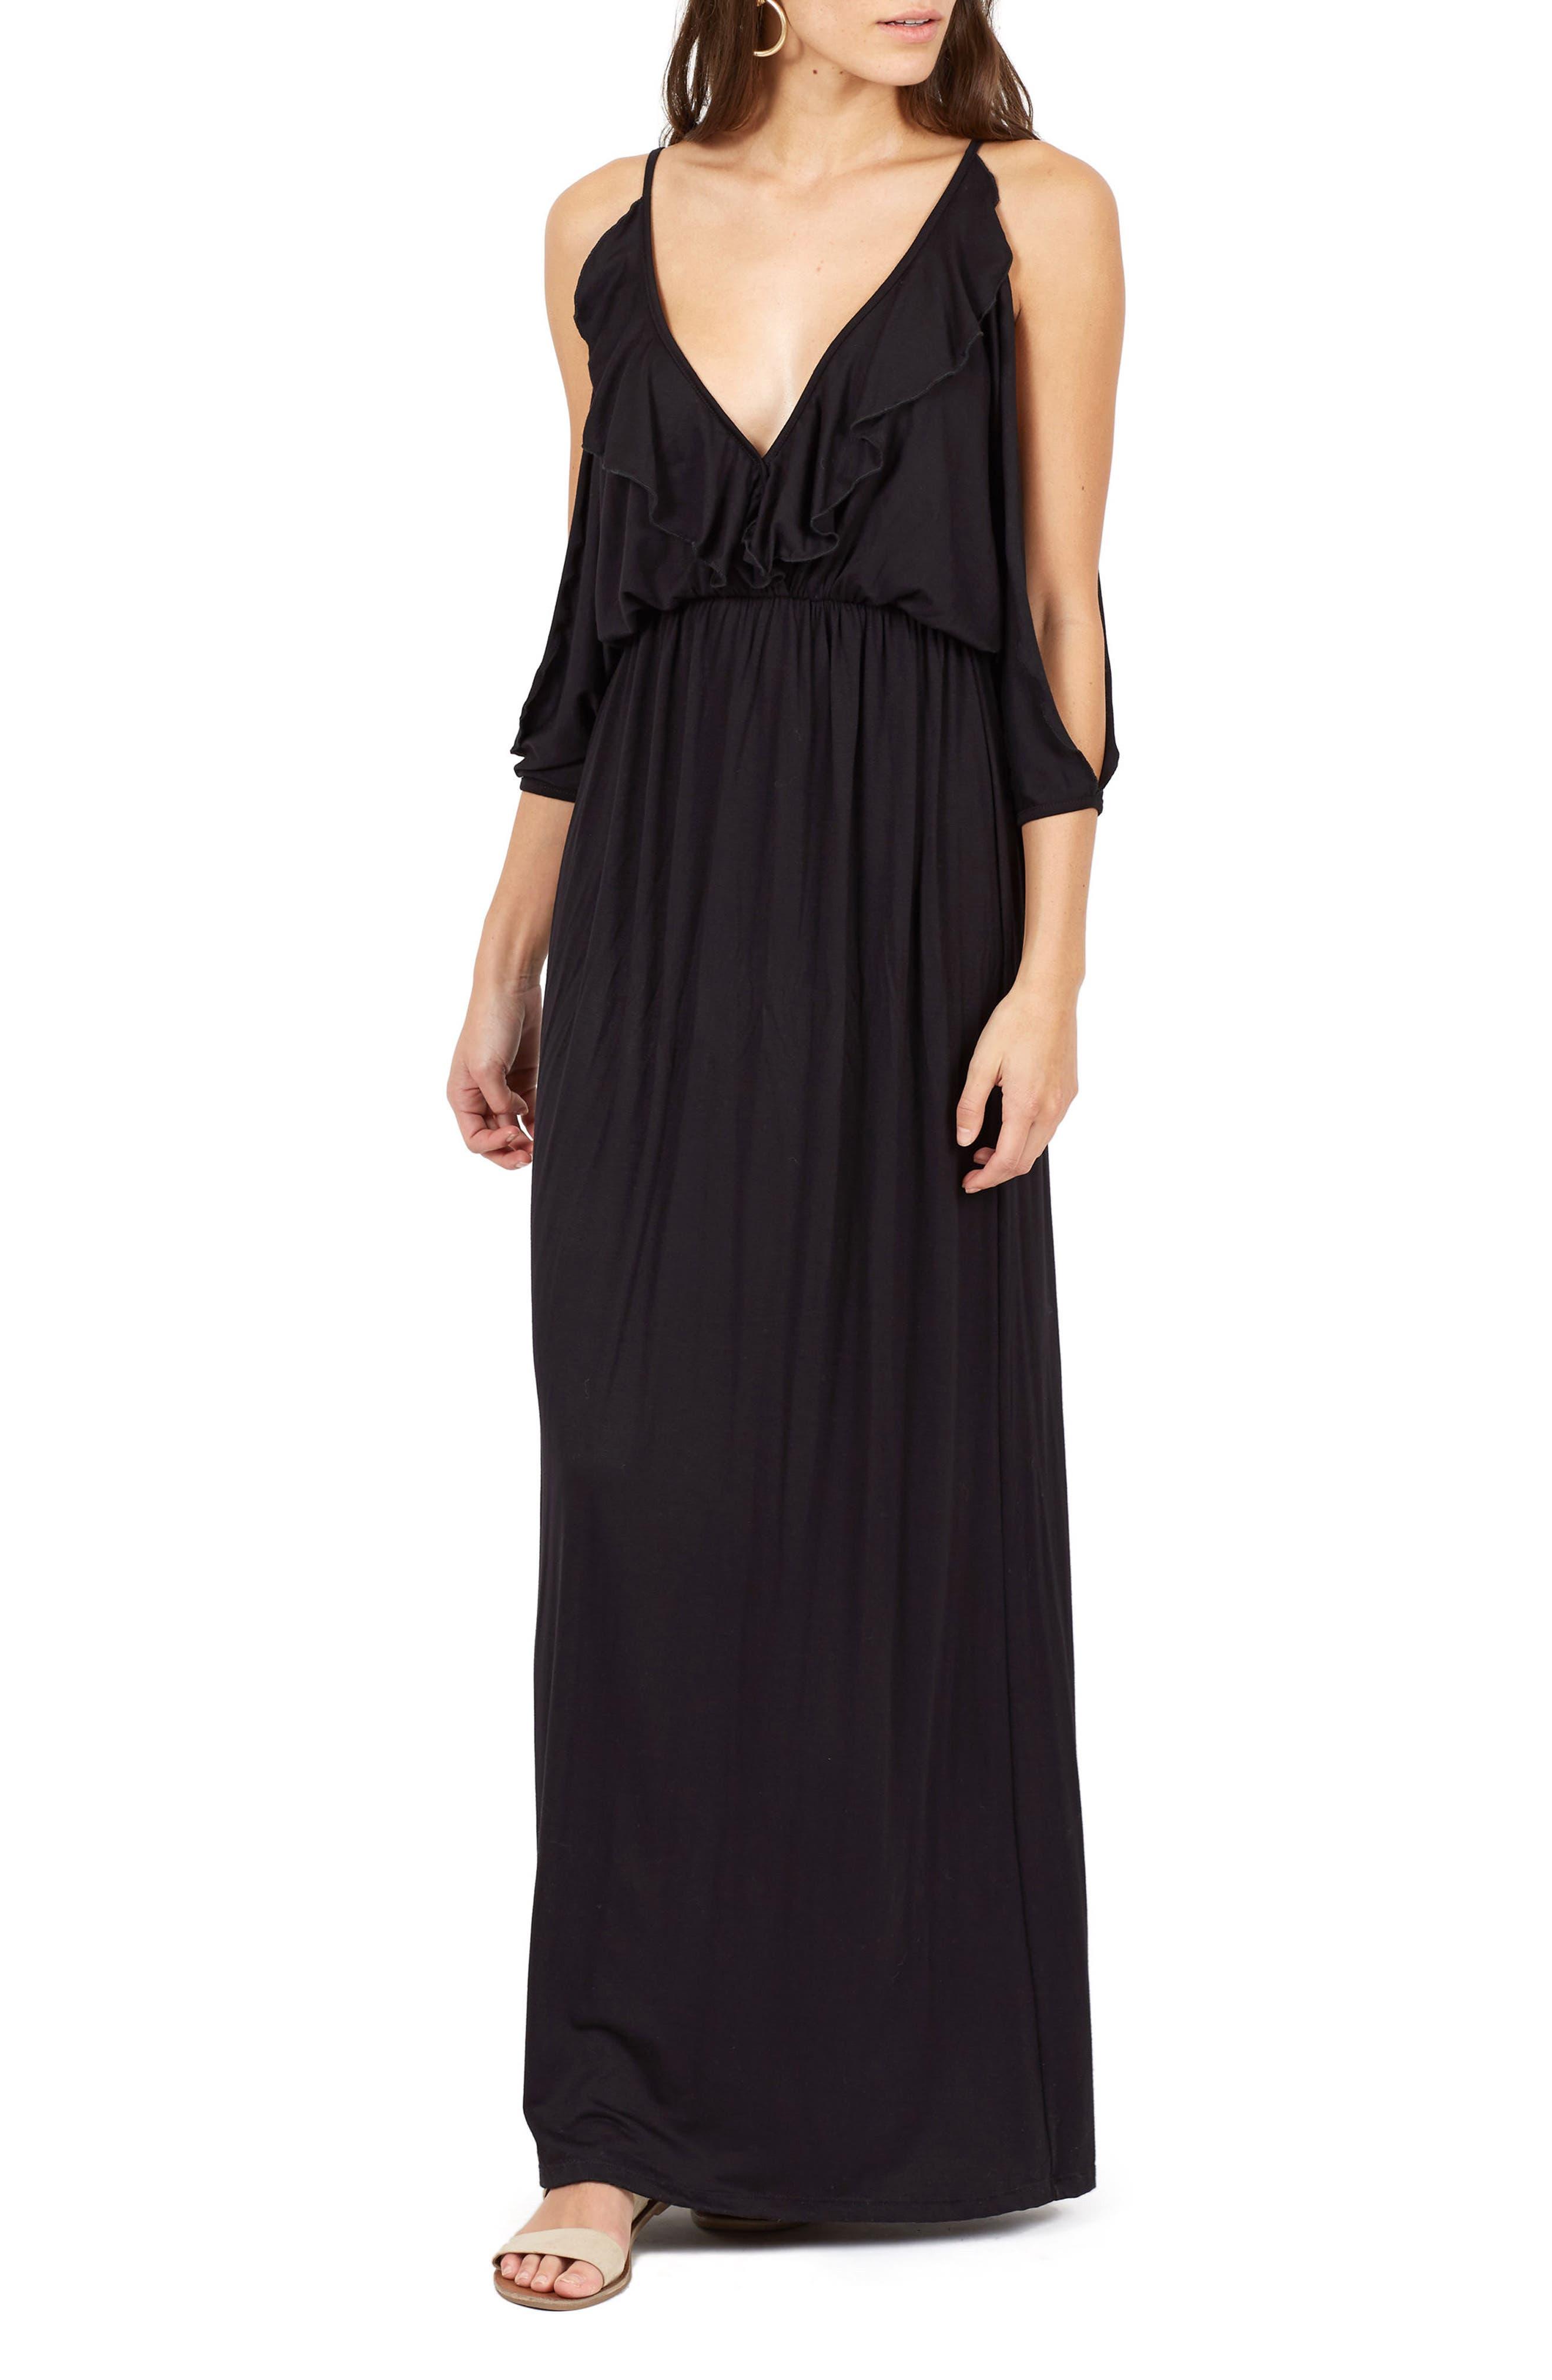 Alternate Image 1 Selected - Delacy Nia Cold Shoulder Maxi Dress